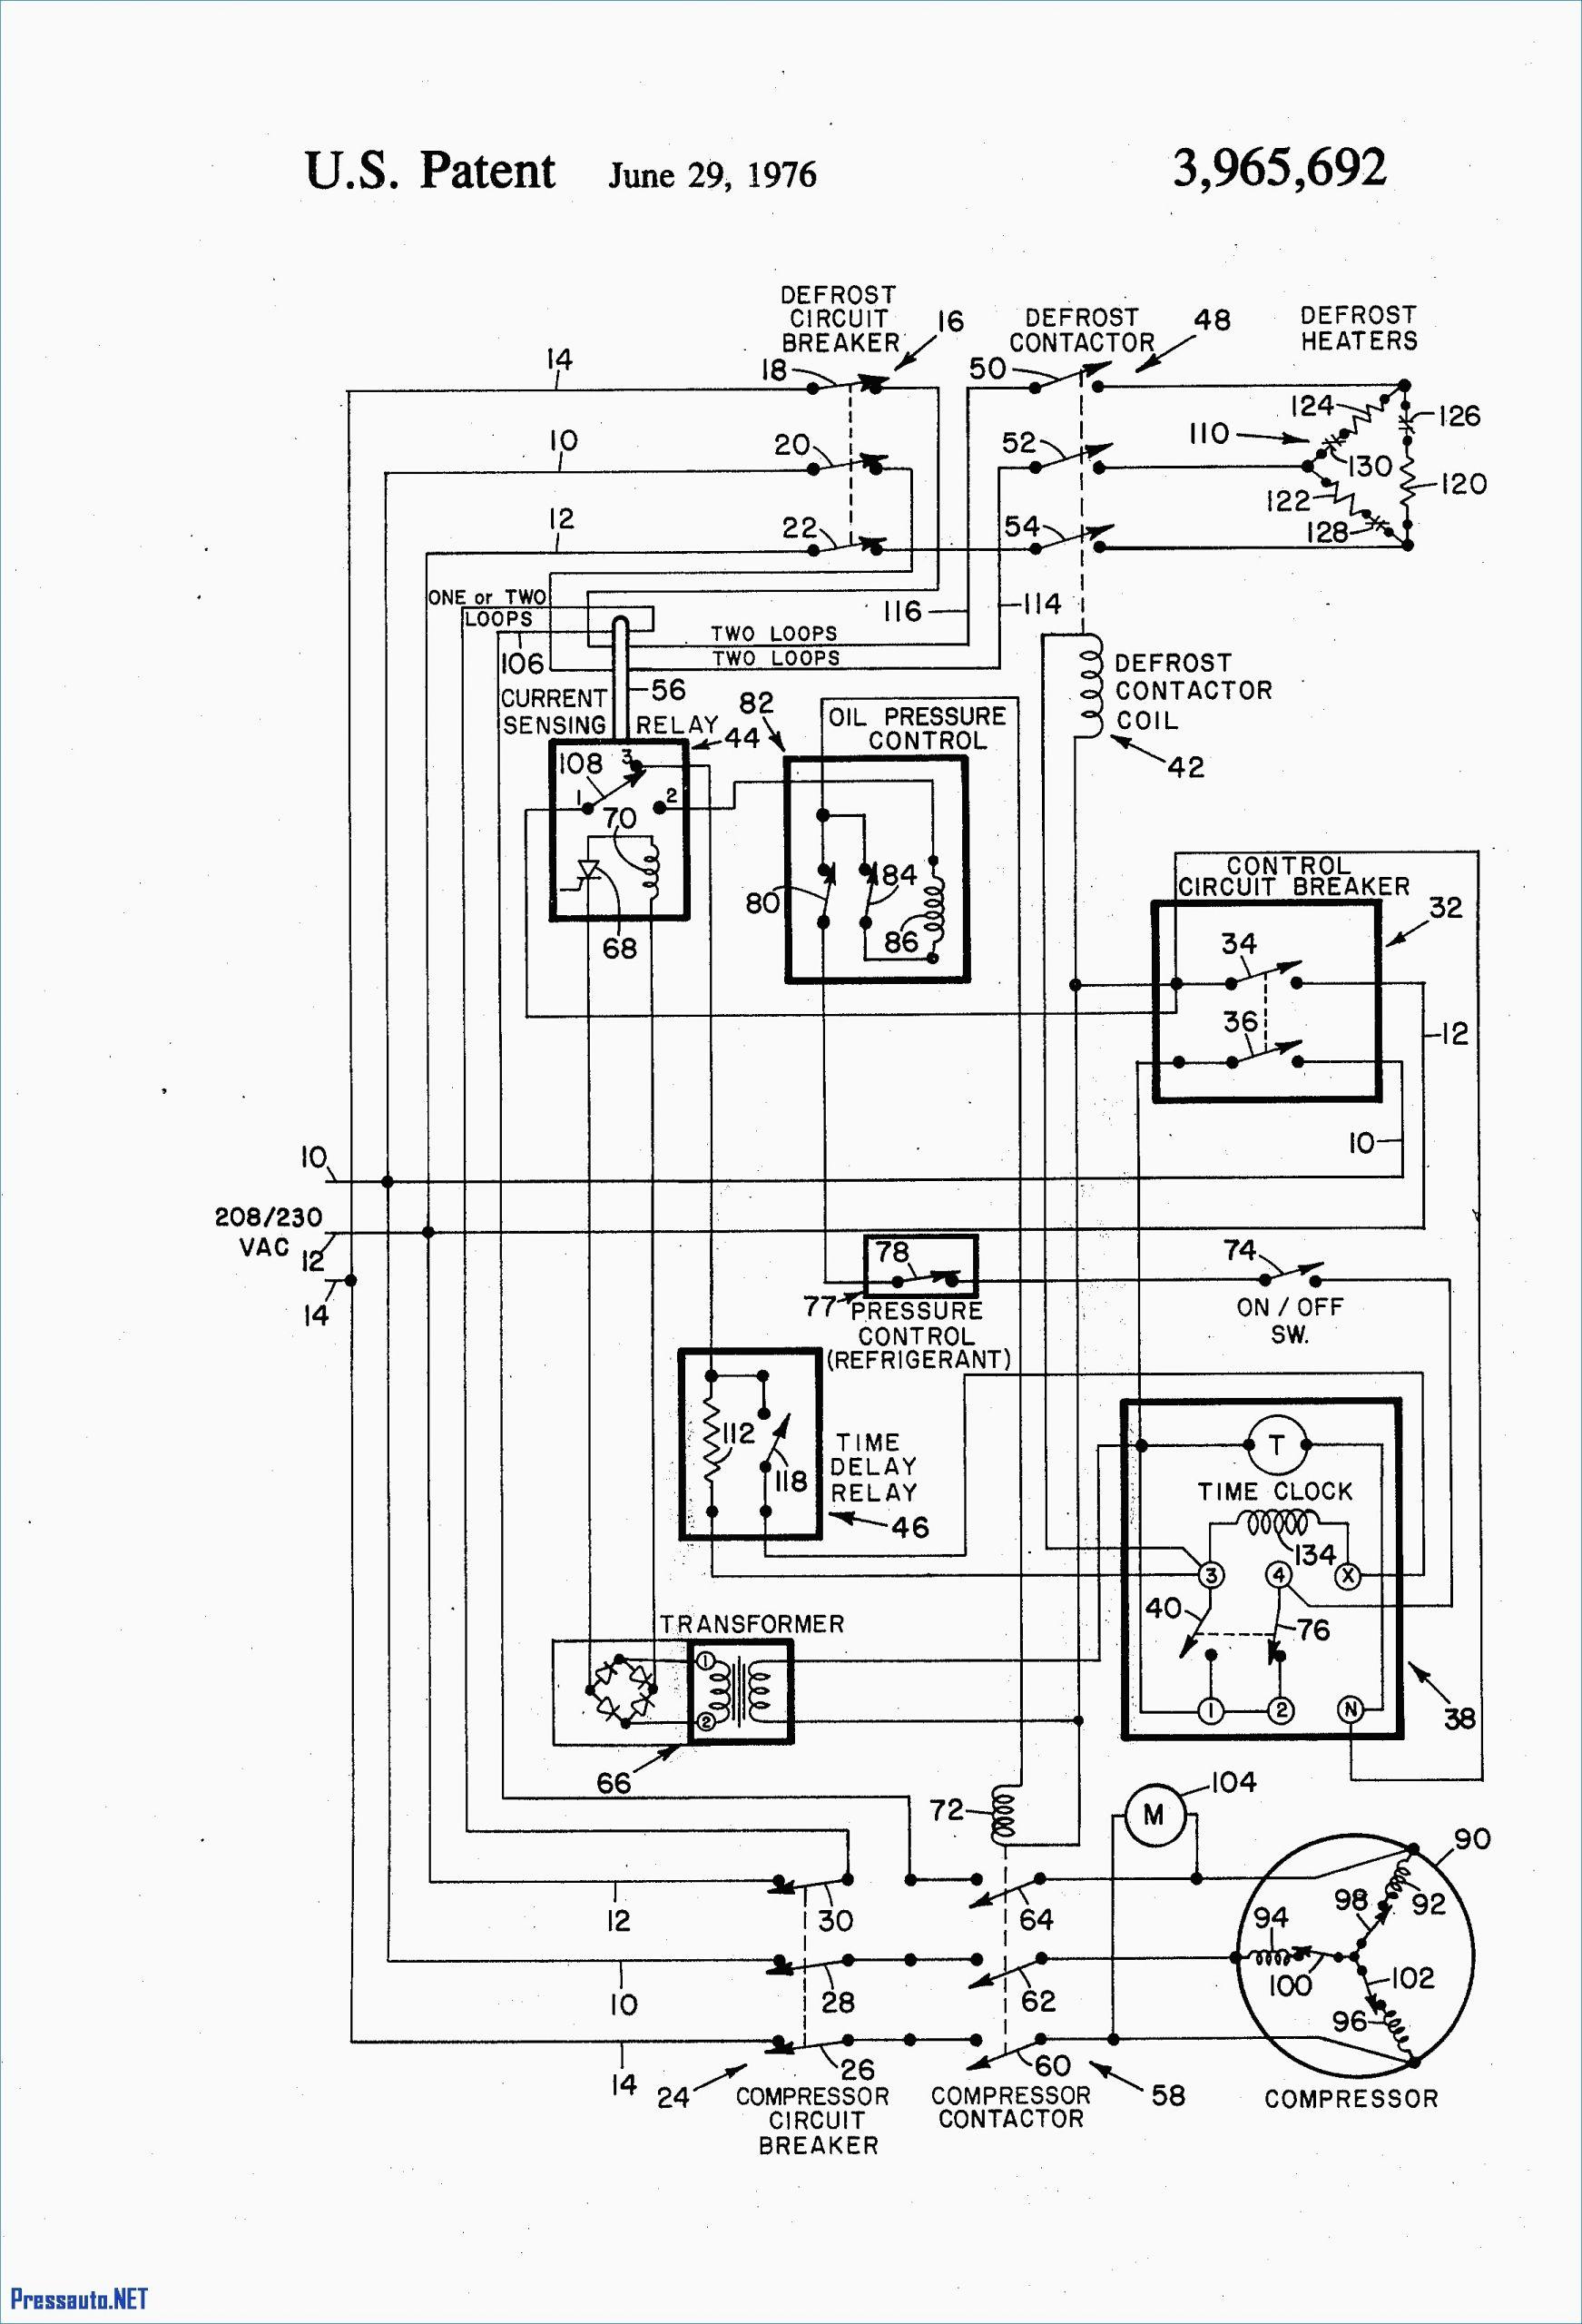 Cutler Hammer A831443-7 Unit Wiring Diagram Cutler Hammer Mcc Bucket Wiring Diagram Wiring Diagram Of Cutler Hammer A831443-7 Unit Wiring Diagram